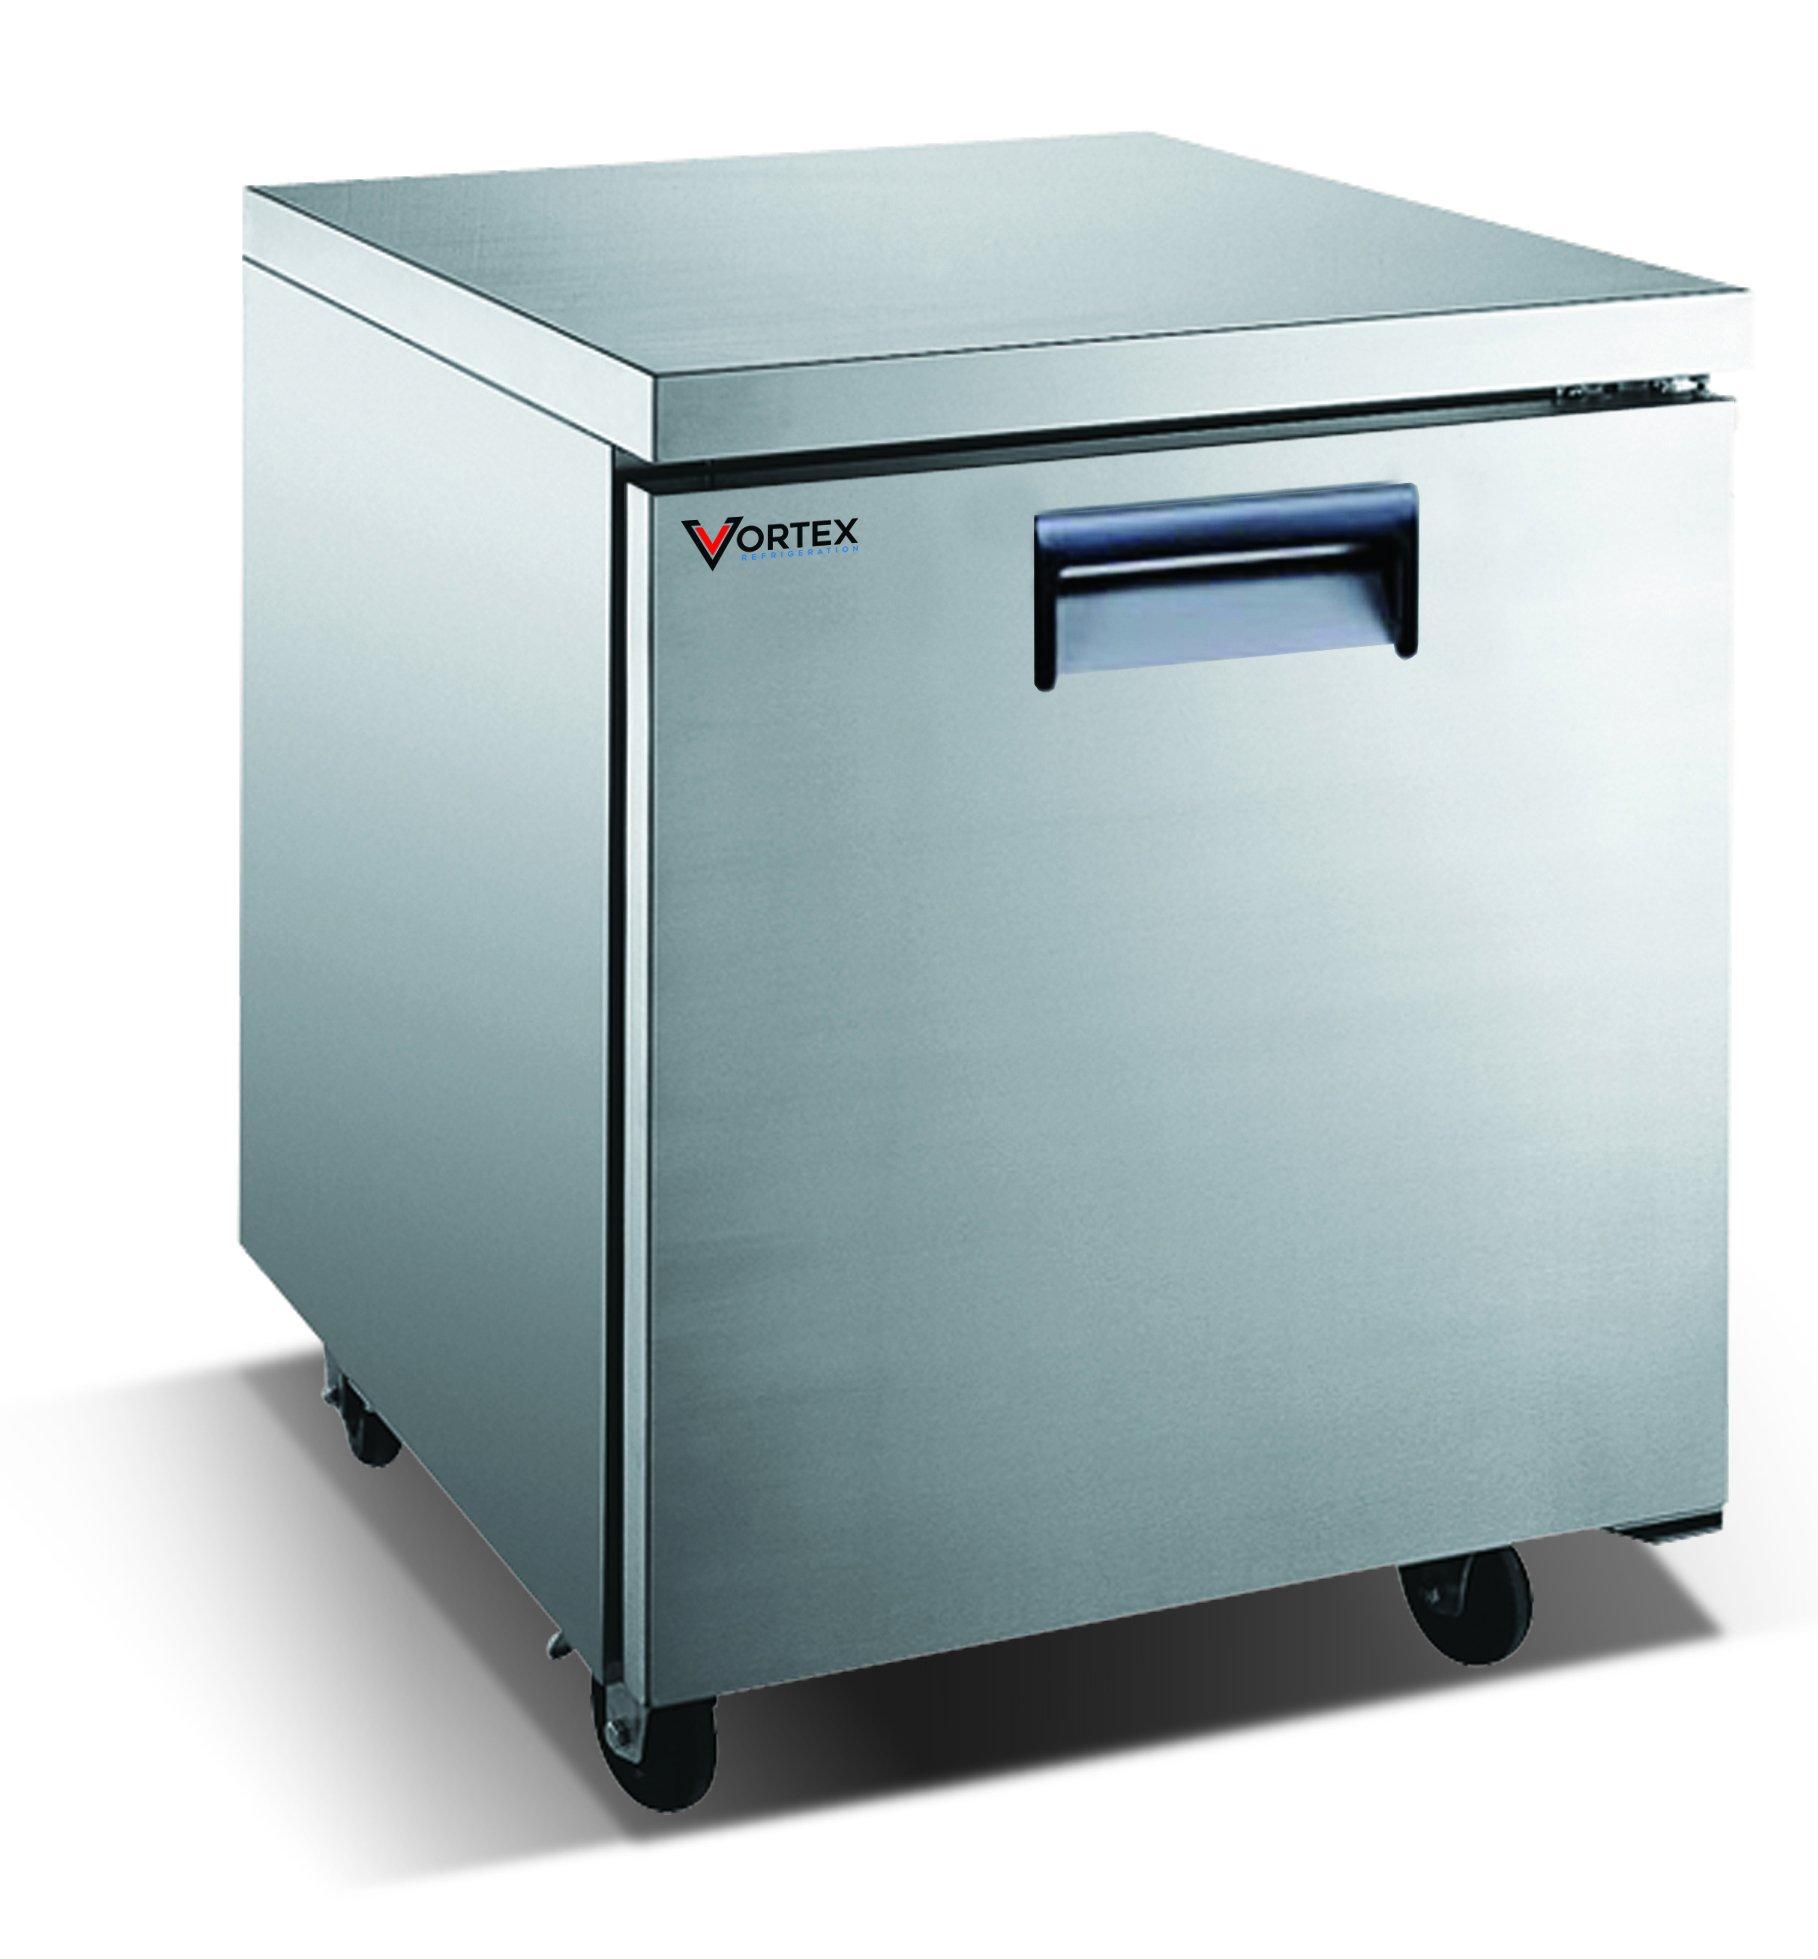 Vortex Refrigeration Commercial 1 Door 27'' Under Counter Refrigerator - 6.25 Cu. Ft. by Vortex Refrigeration